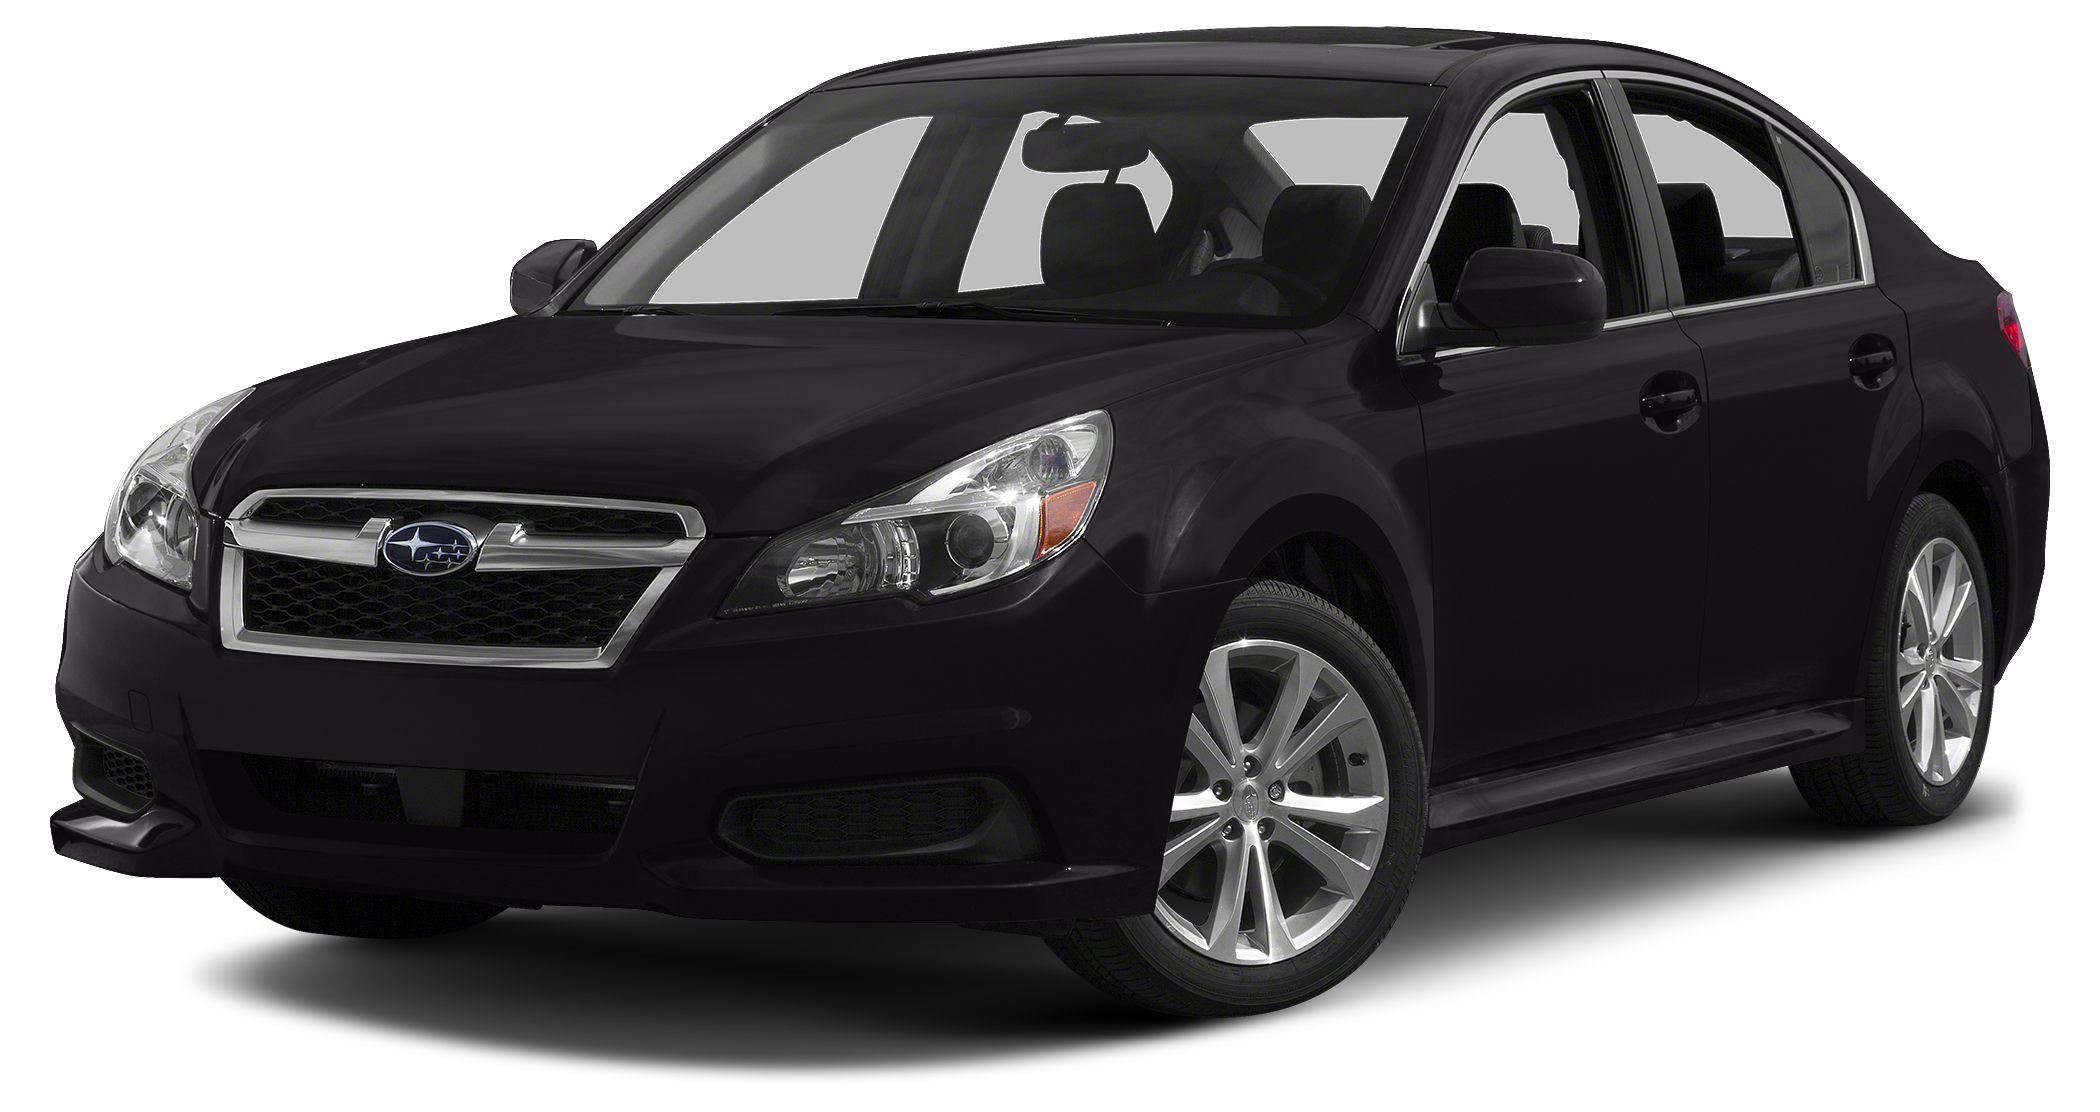 2014 Subaru Legacy 25i Premium Miles 33854Color Crystal Black Silica Stock 151758A VIN 4S3BM